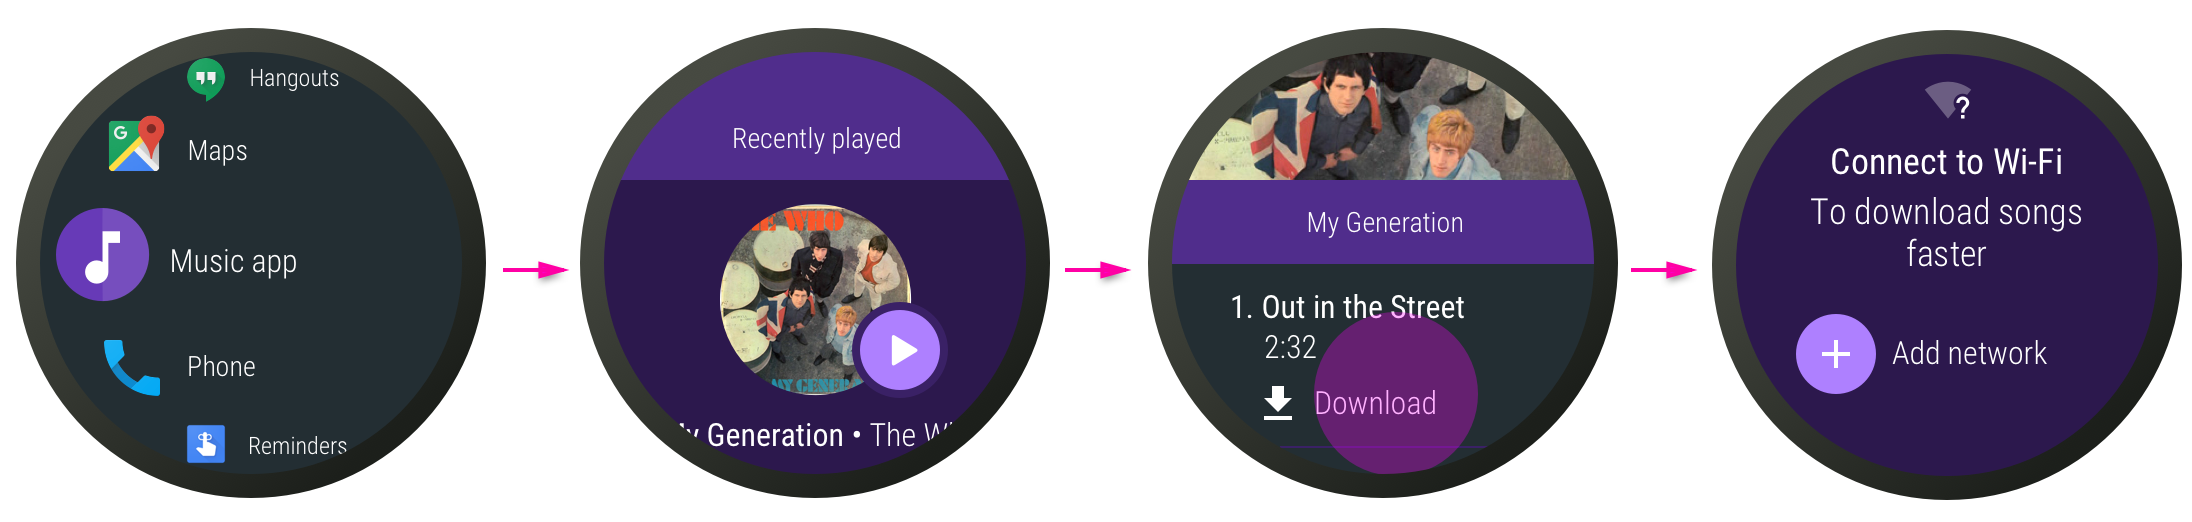 Music downloading